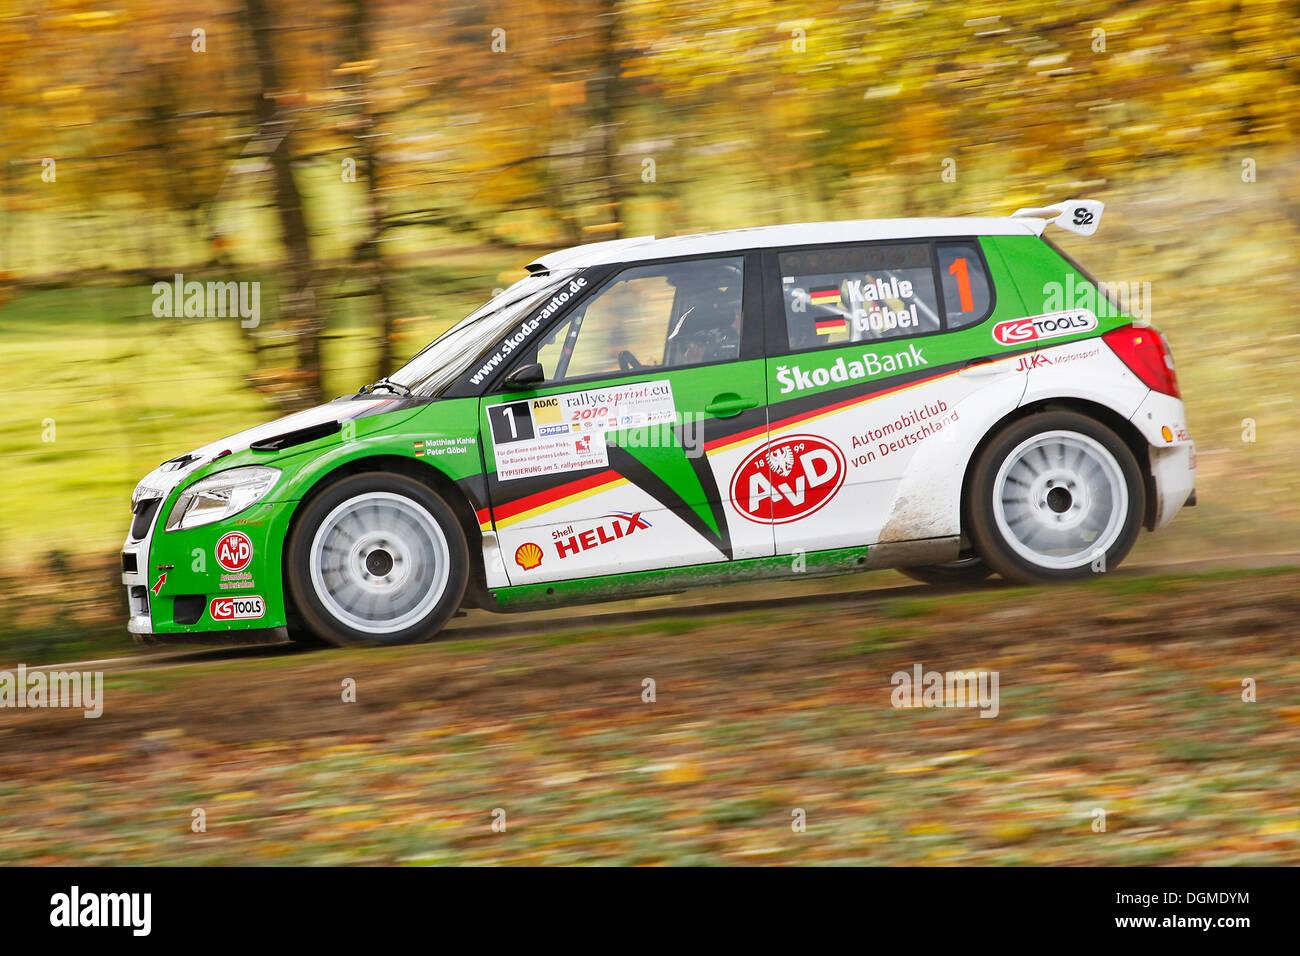 Skoda Fabia S2000, driven by Matthias Kahle, German Rally Champion 2010, Rallye Stehr Rallyesprint 2010, Hesse - Stock Image